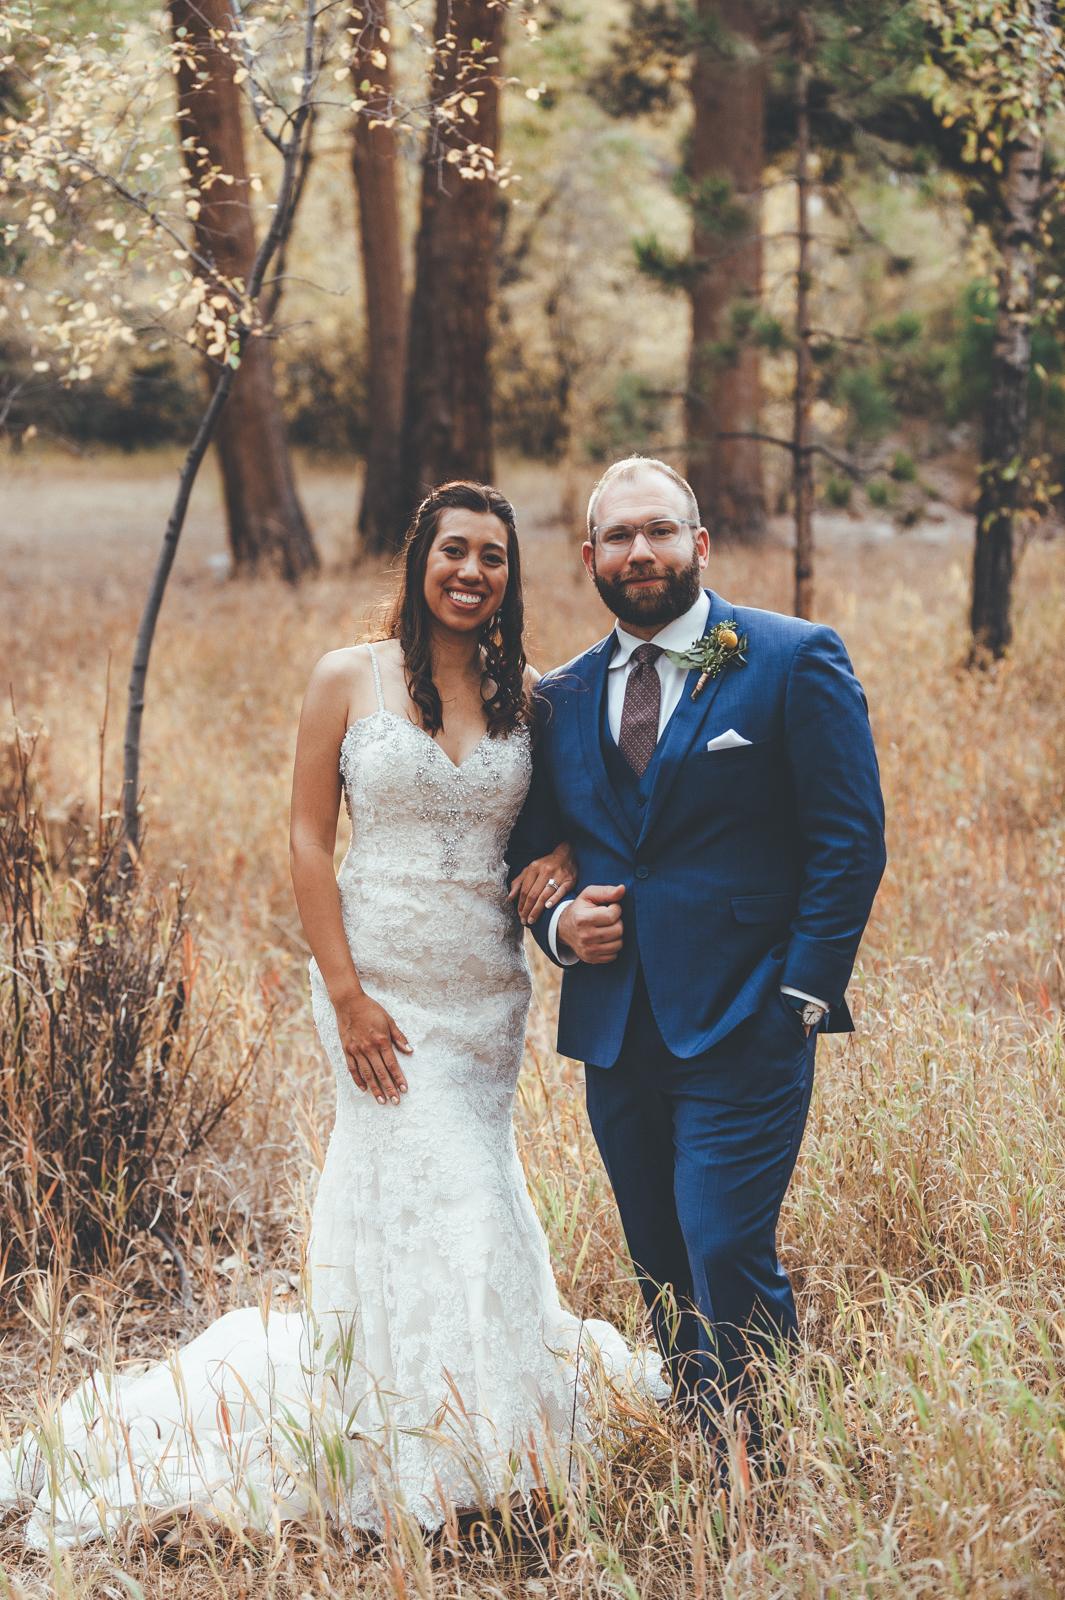 ChadFahnestockPhotography-estes-park-wedding-photography-039.jpg